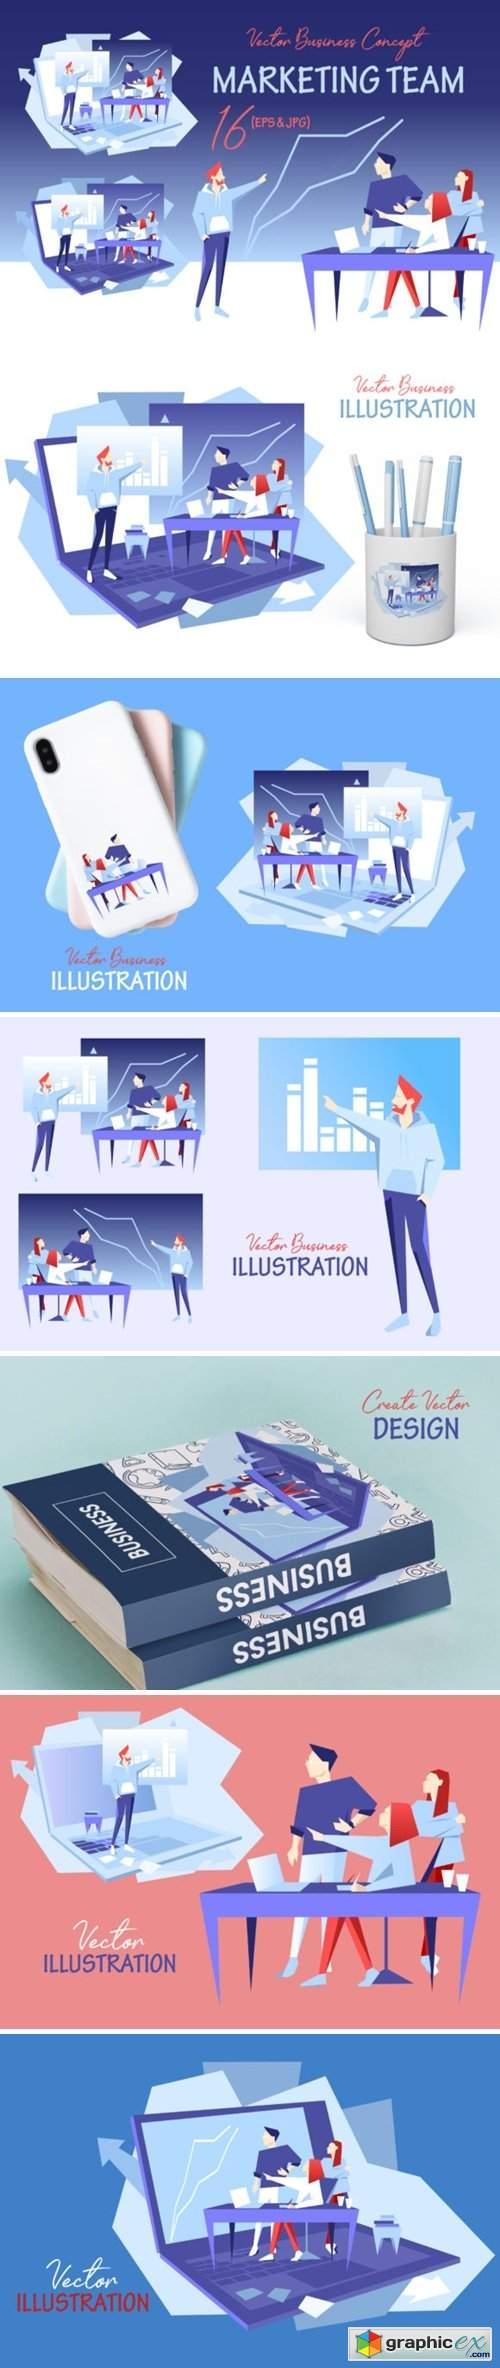 Marketing Team Vector Design Set